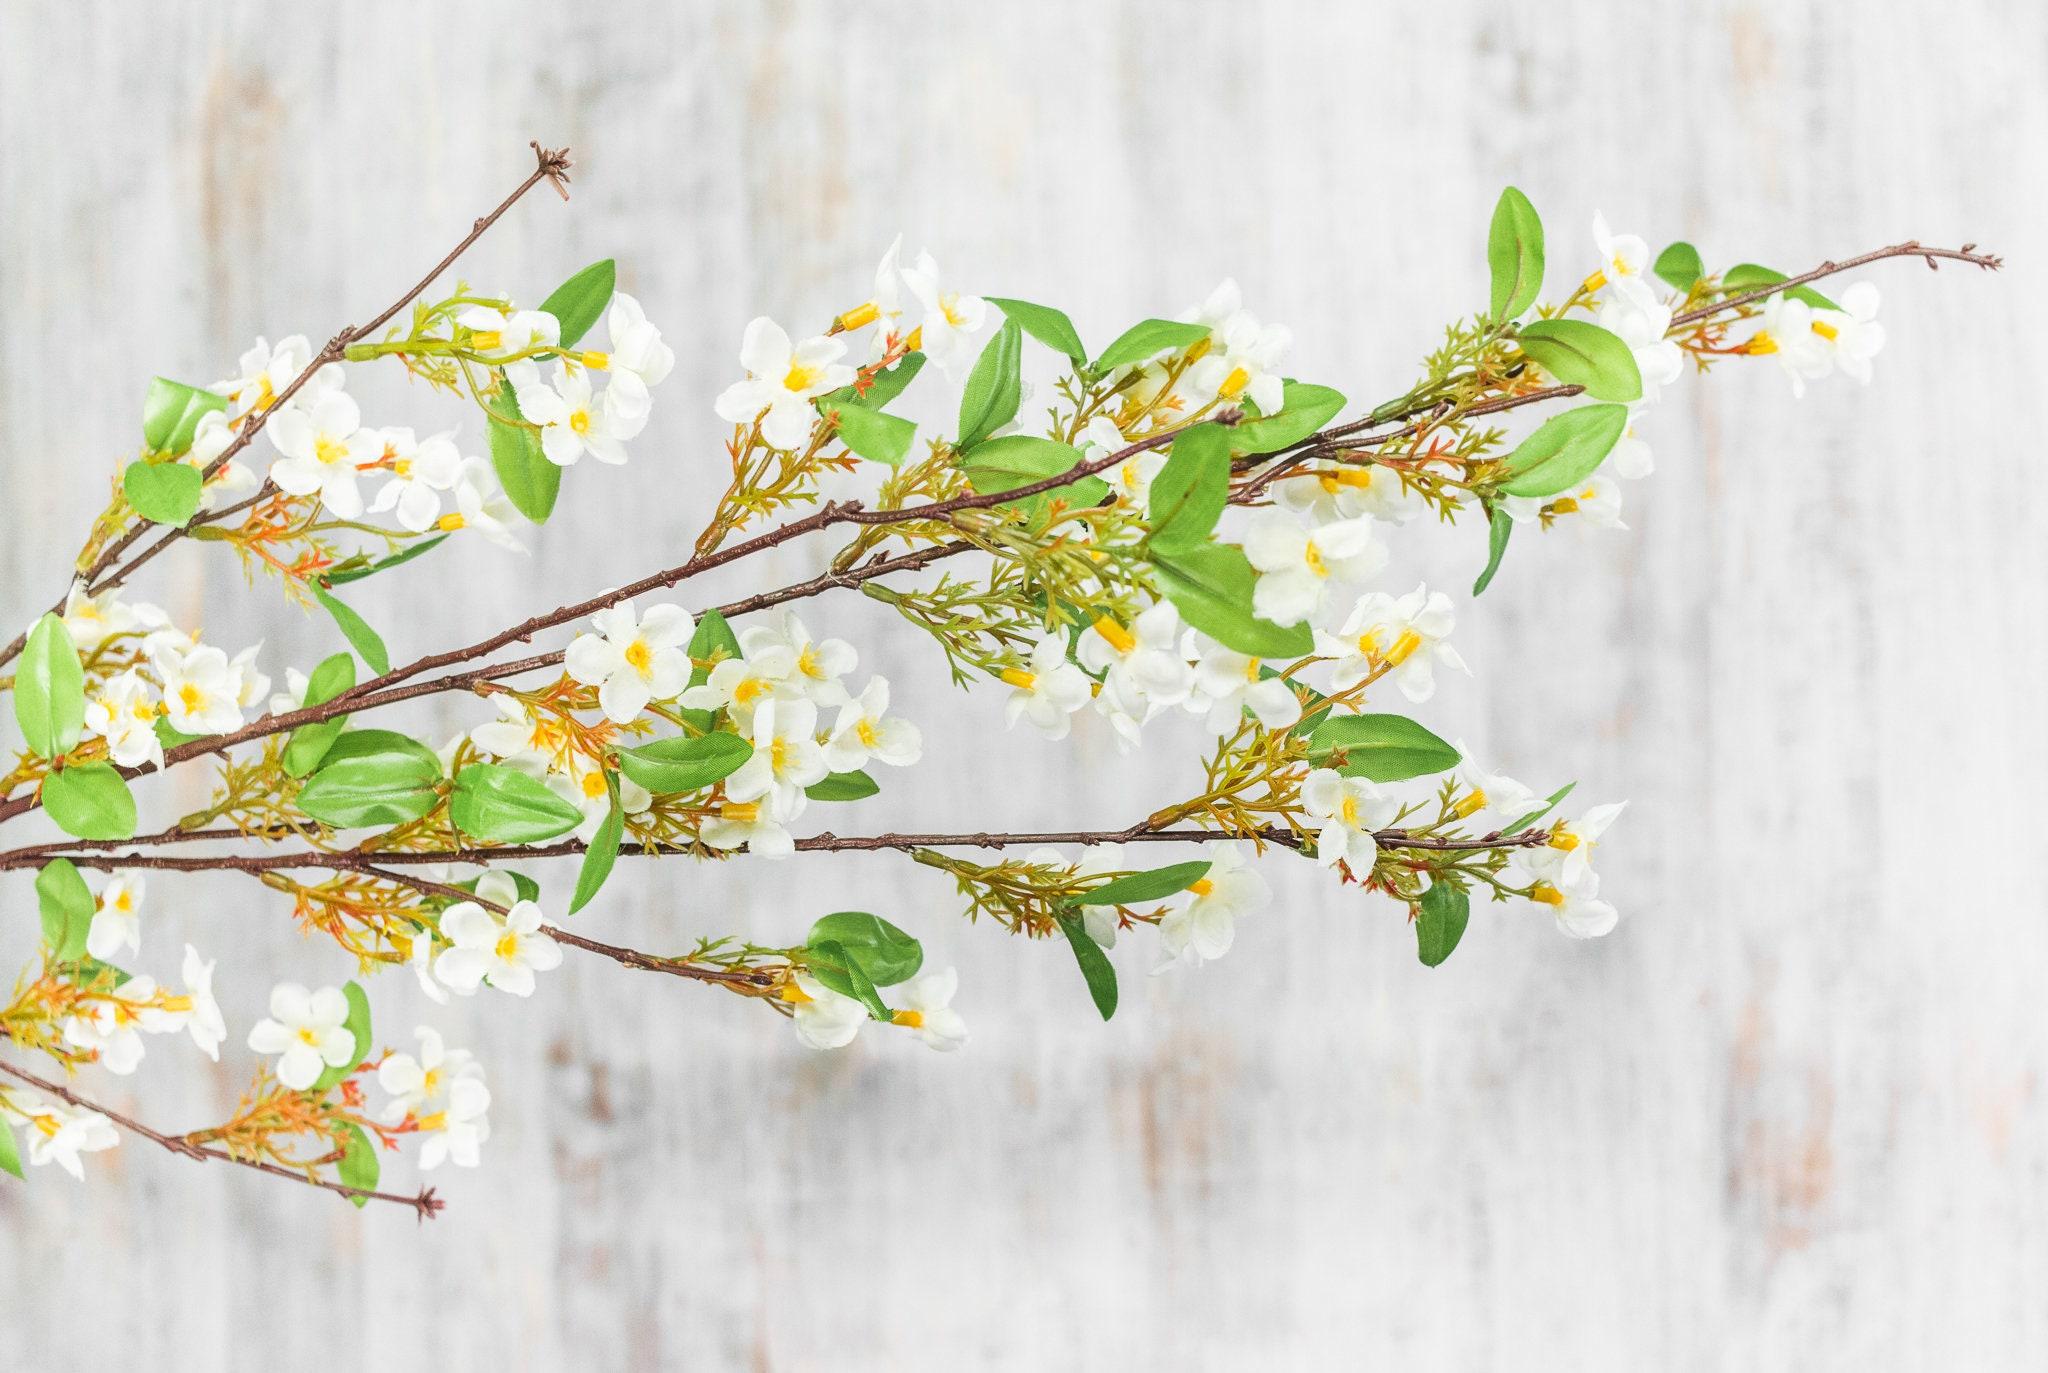 23612 Pcs 55 Large Long Stem White Dogwood Blossoms Etsy